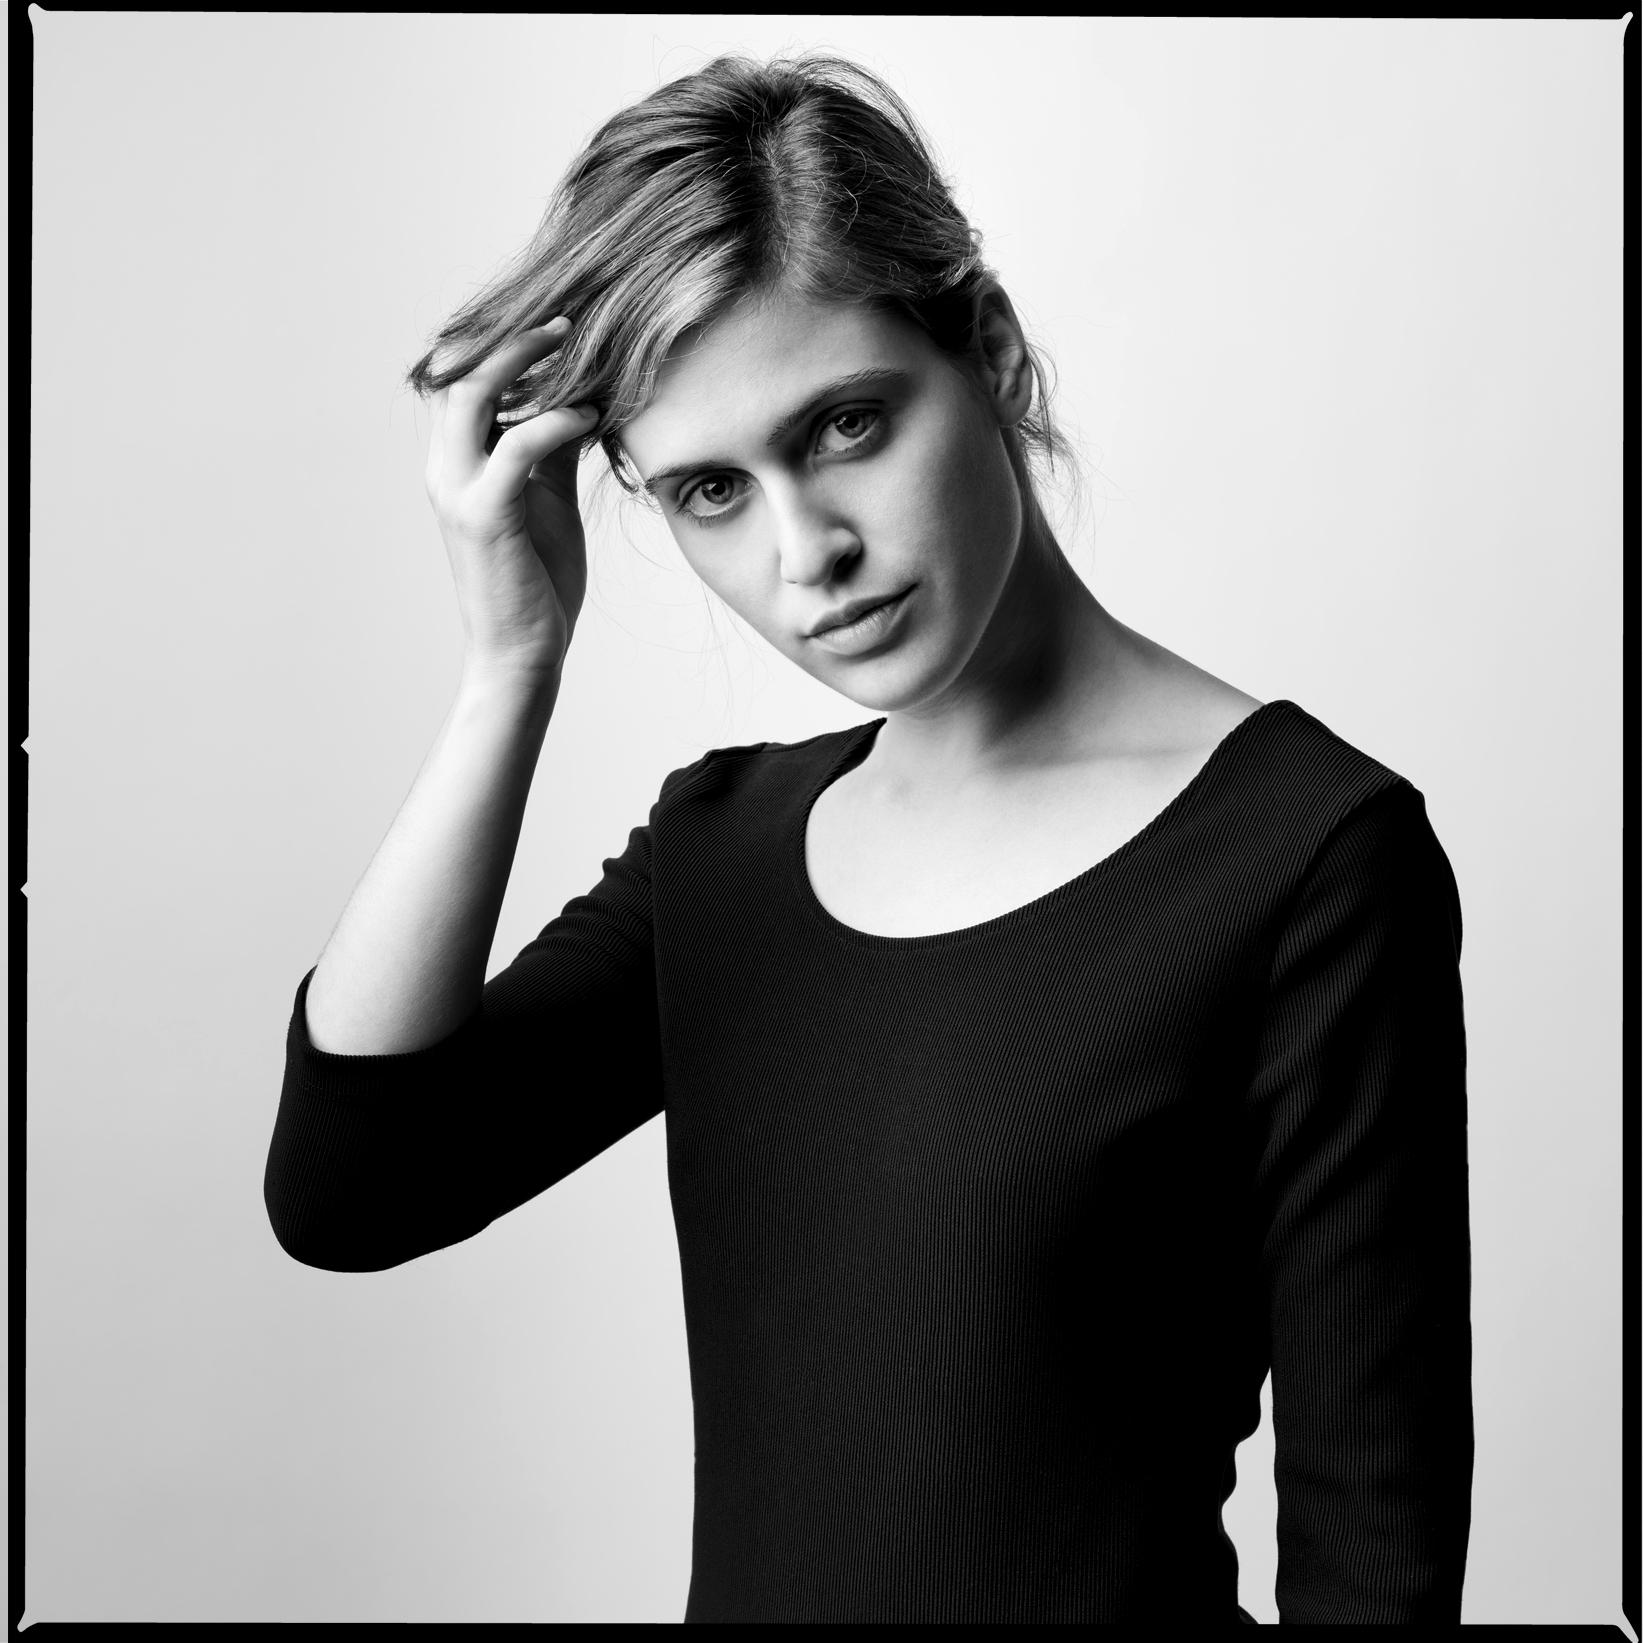 Oscar_Arribas_Portrait_photography_retrato_editorial_project_fotografia_studio_36.jpg